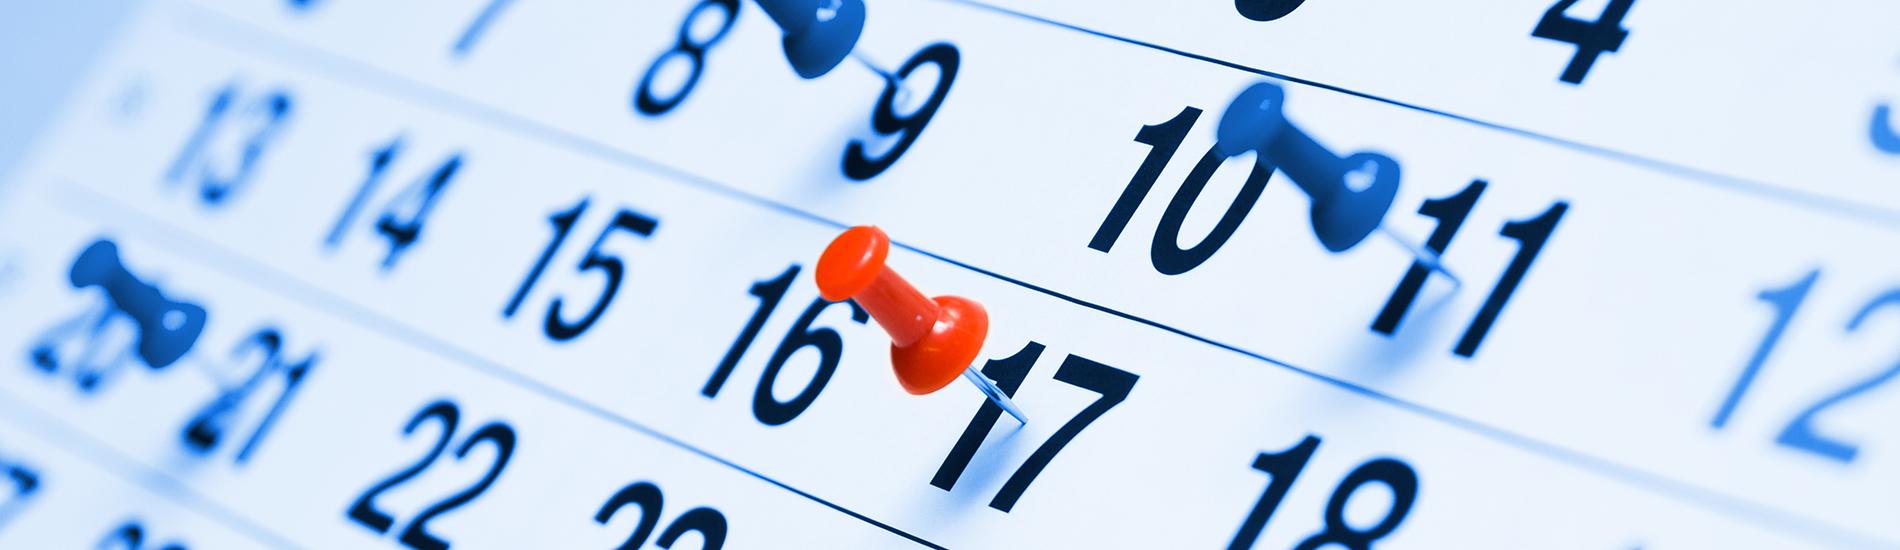 Utmb Match List 2020.Academic Calendar Utmb School Of Medicine Utmb